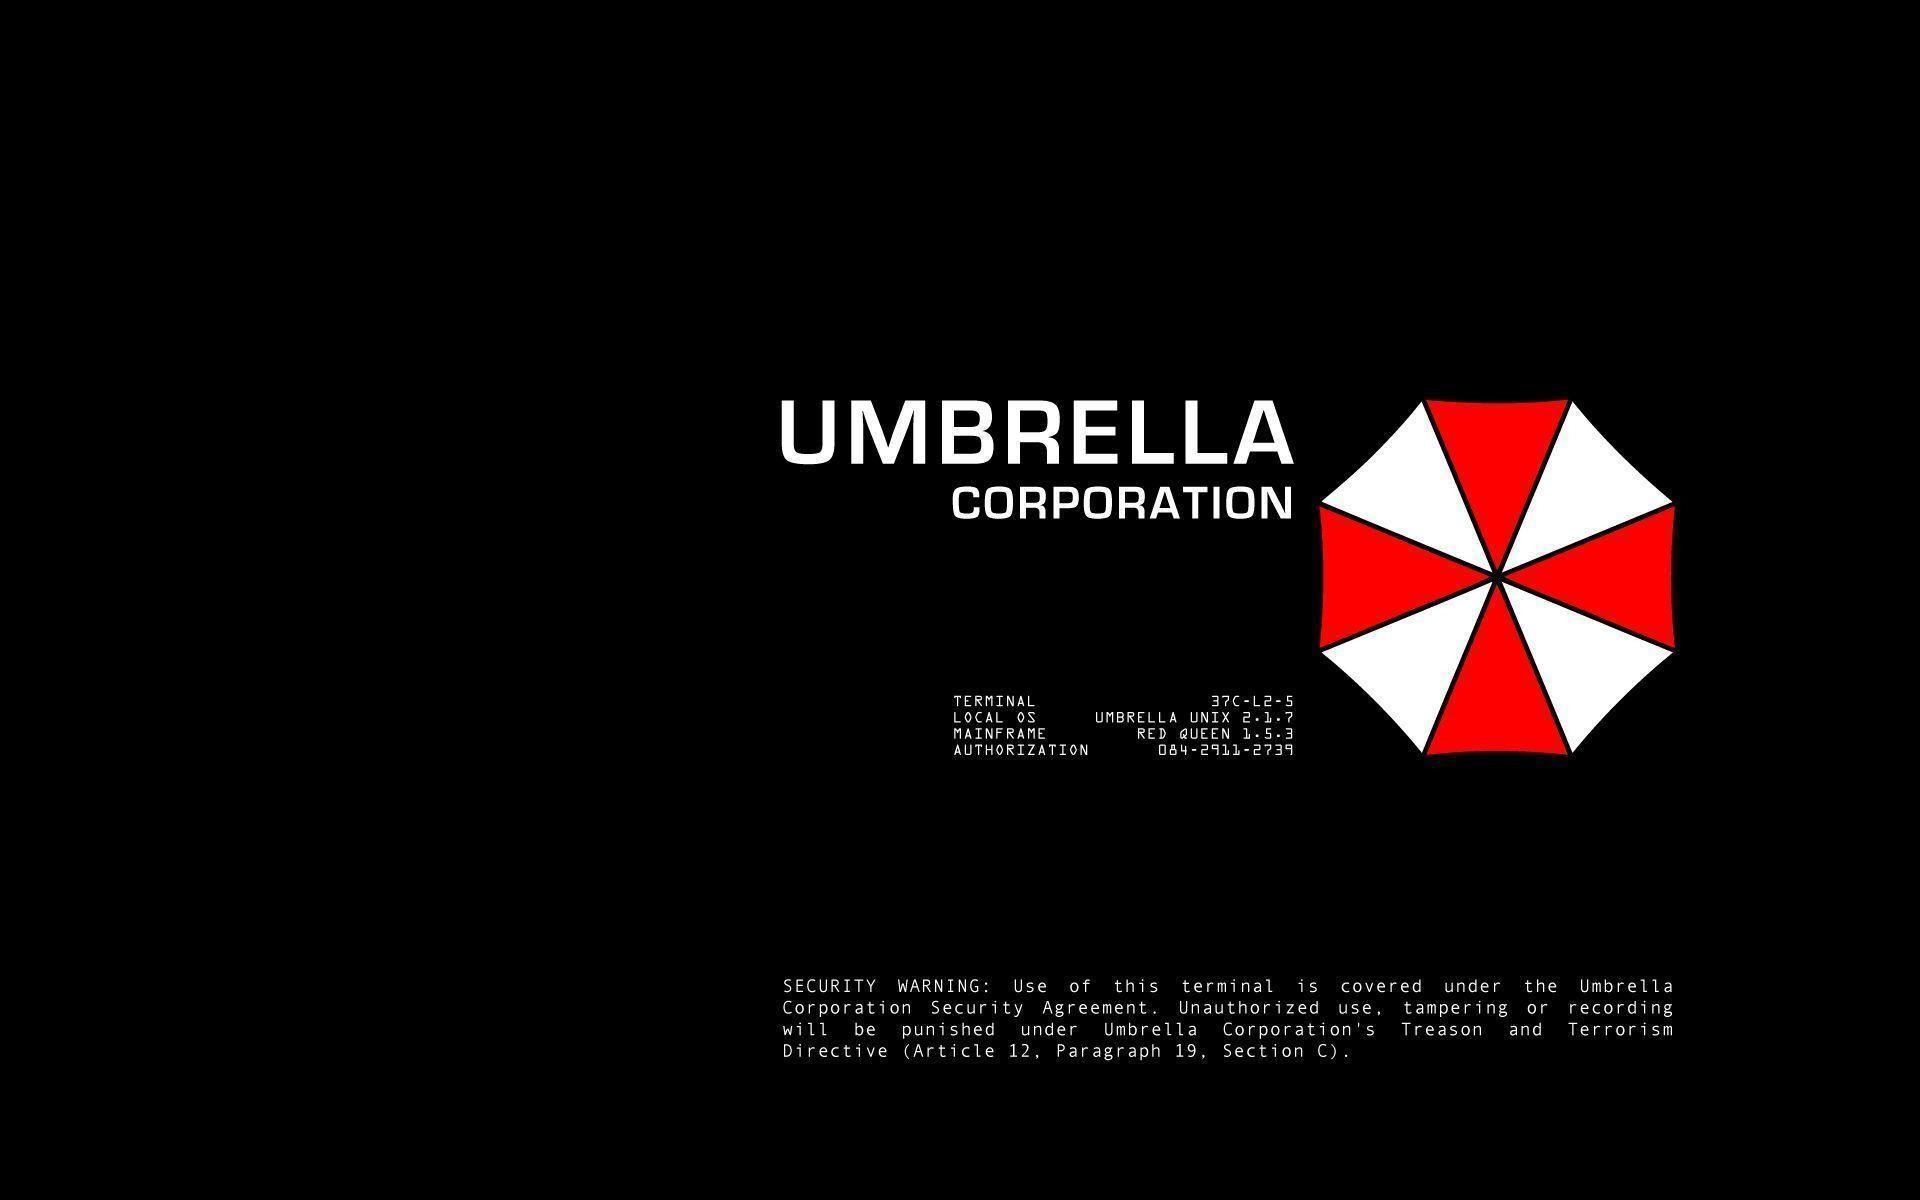 Resident Evil Umbrella Corp Logos Black Background 1440×900 Wallpaper